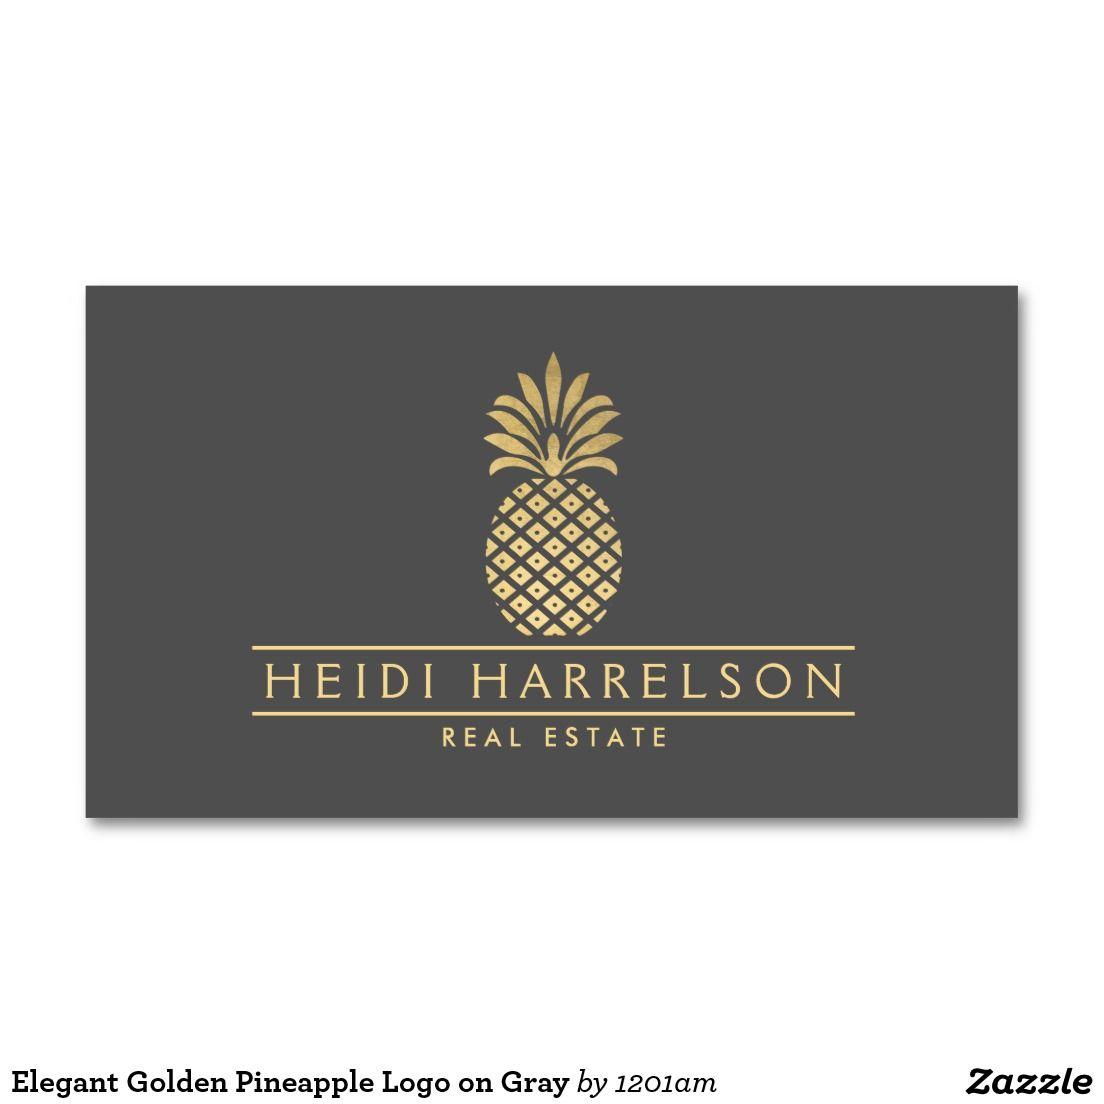 Elegant golden pineapple logo on gray business card airbnb host elegant golden pineapple logo on gray business cards for real estate agent interior designer hospitality airbnb hosts and more colourmoves